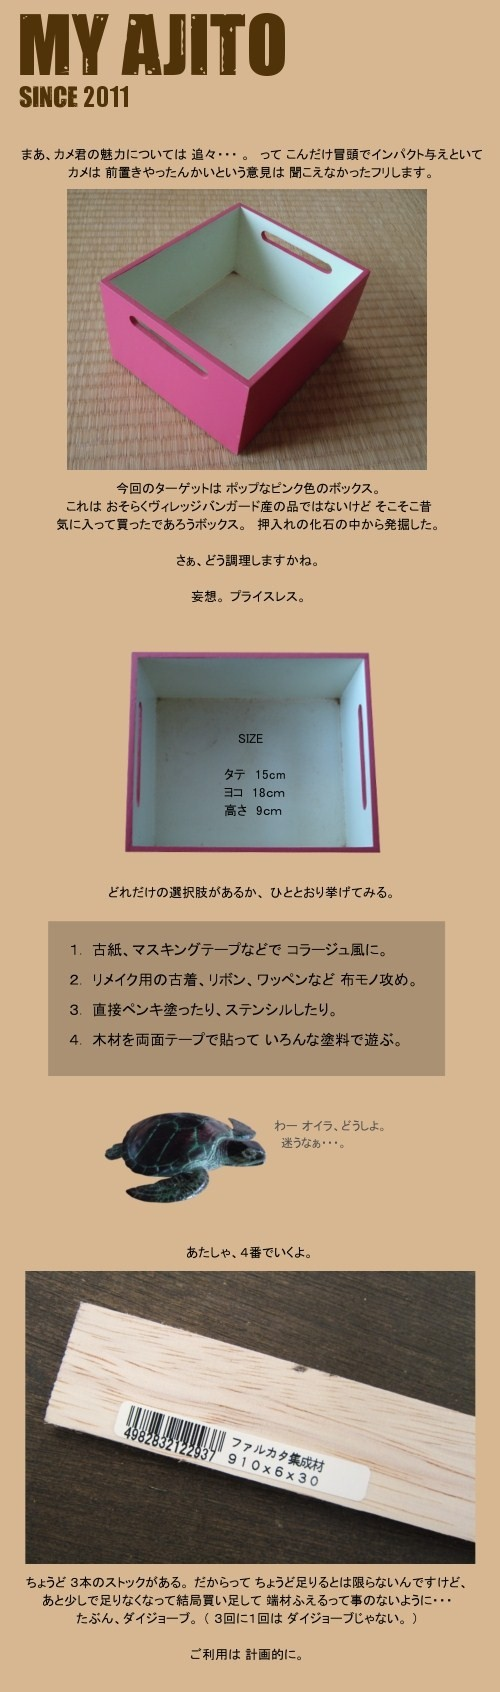 kame_wb_02.jpg